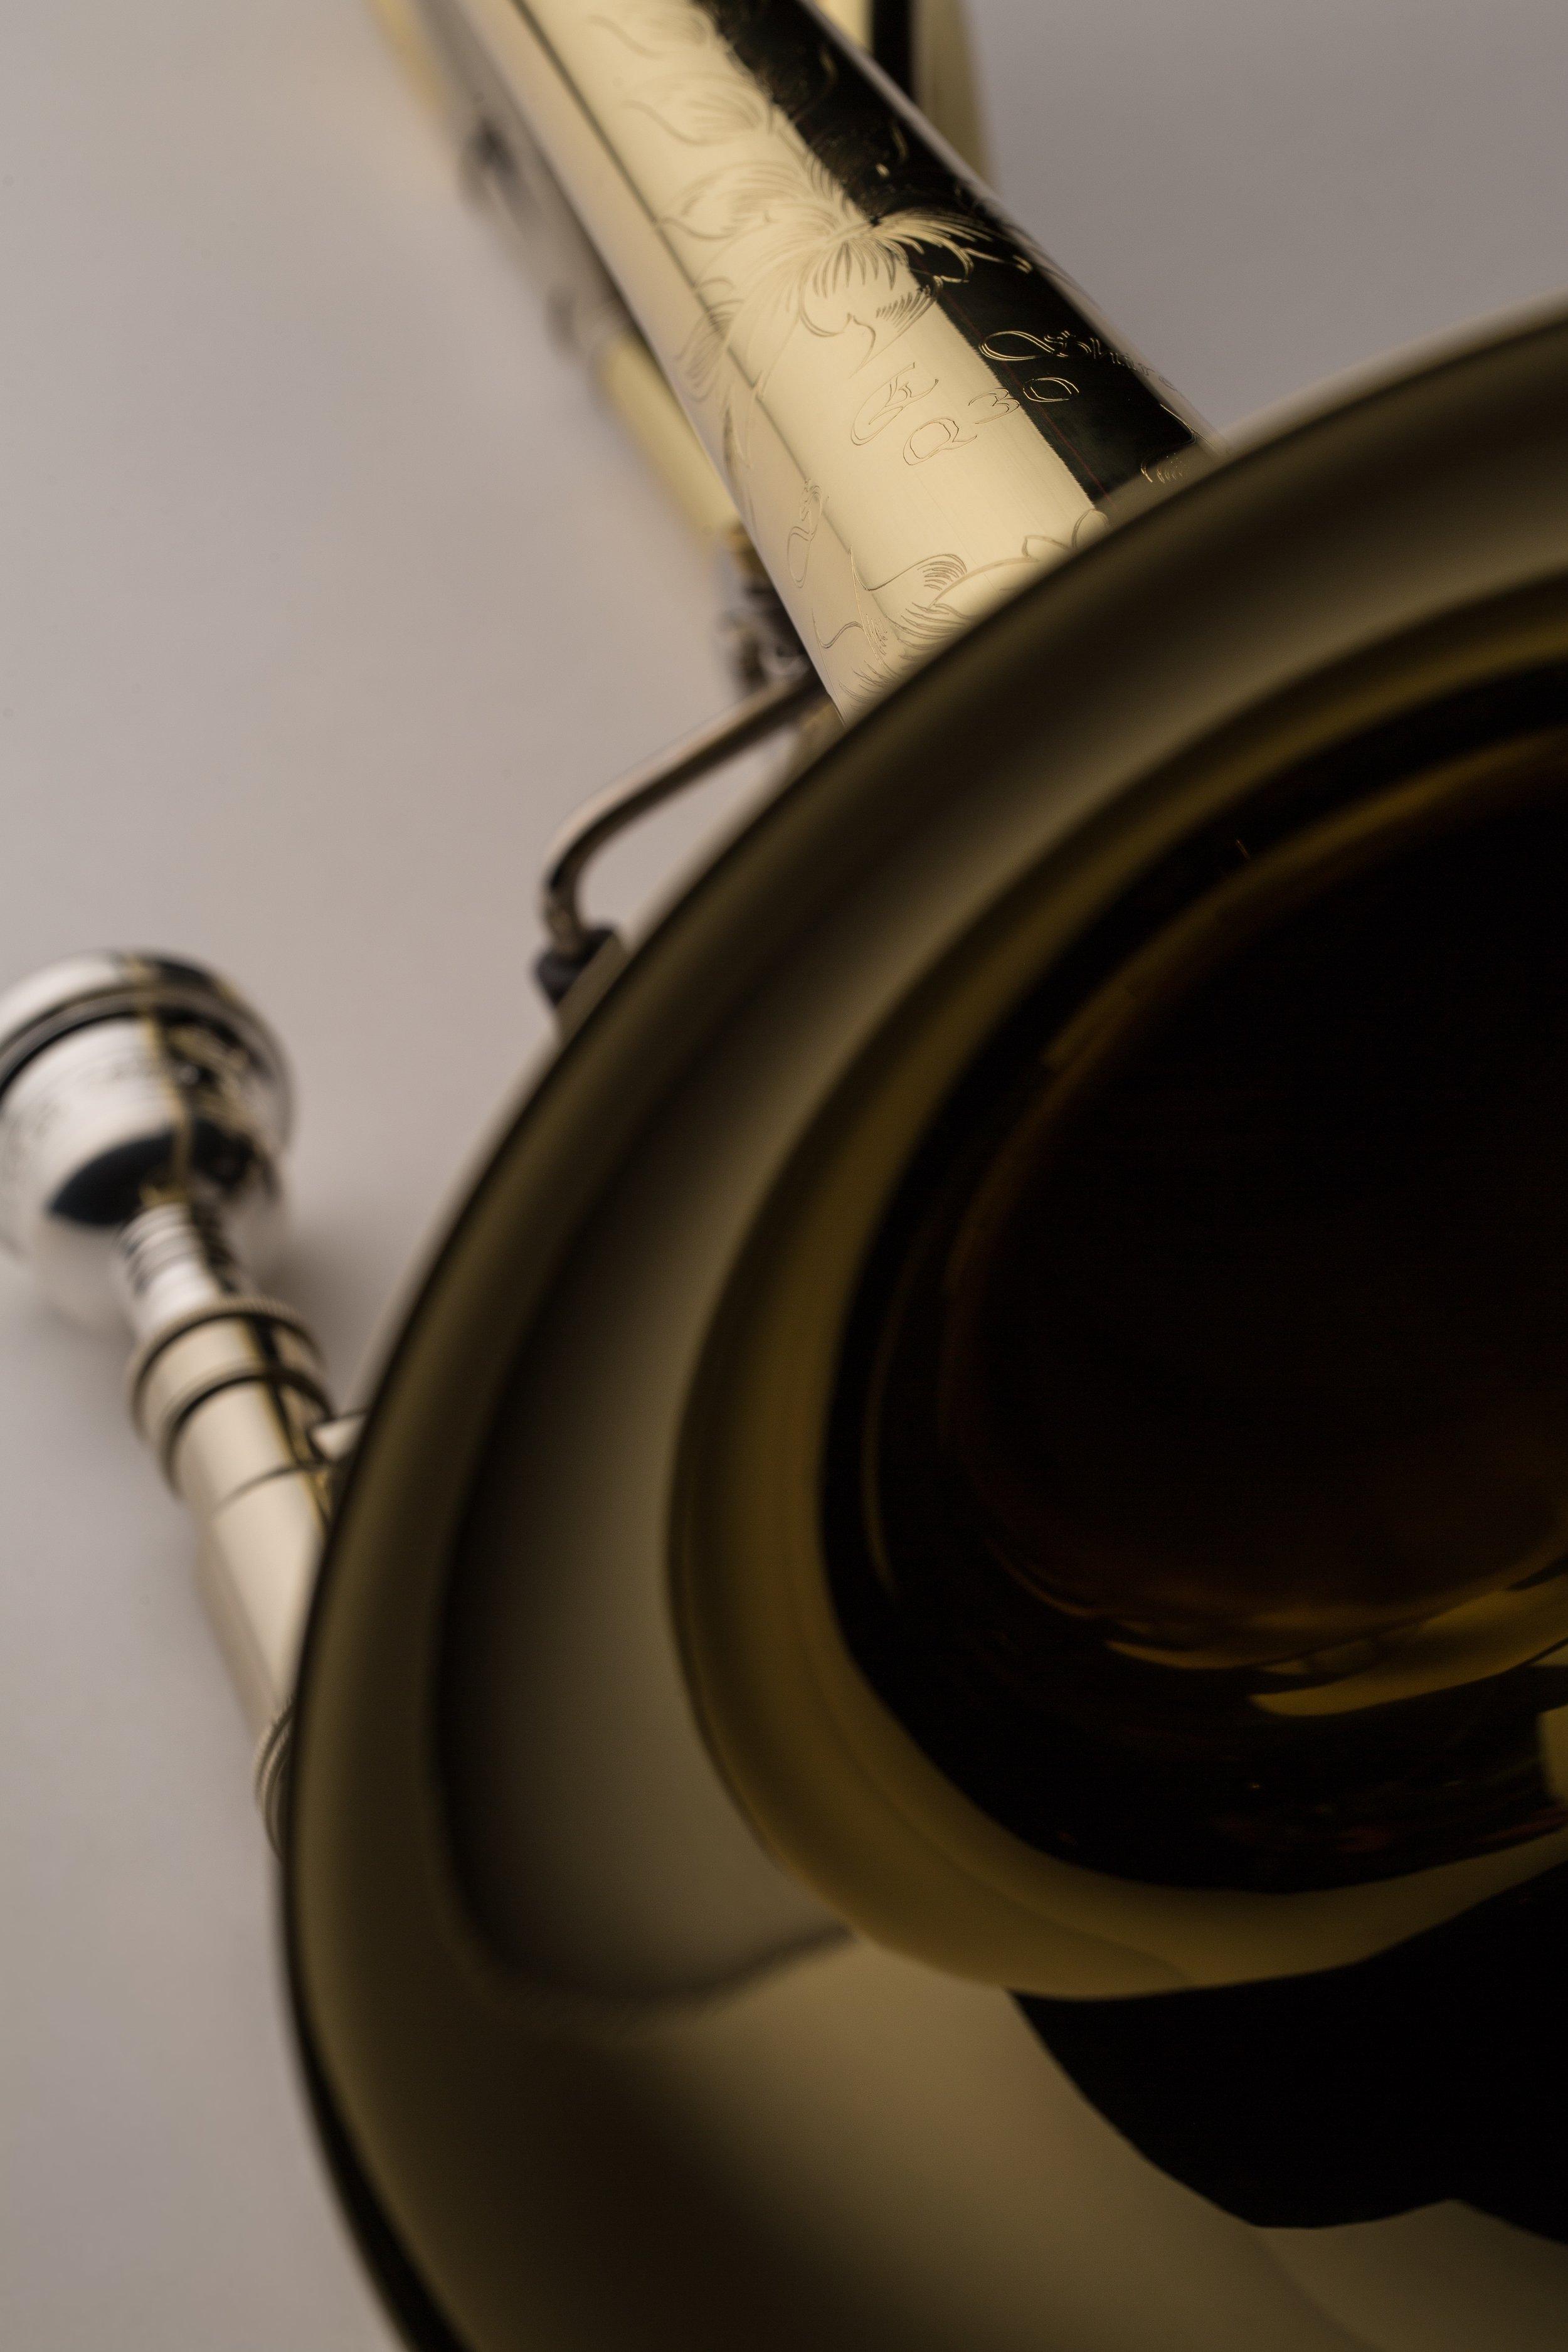 Shires_Trombone_TBQ30YR_CU_Bell_0718 (1).jpg